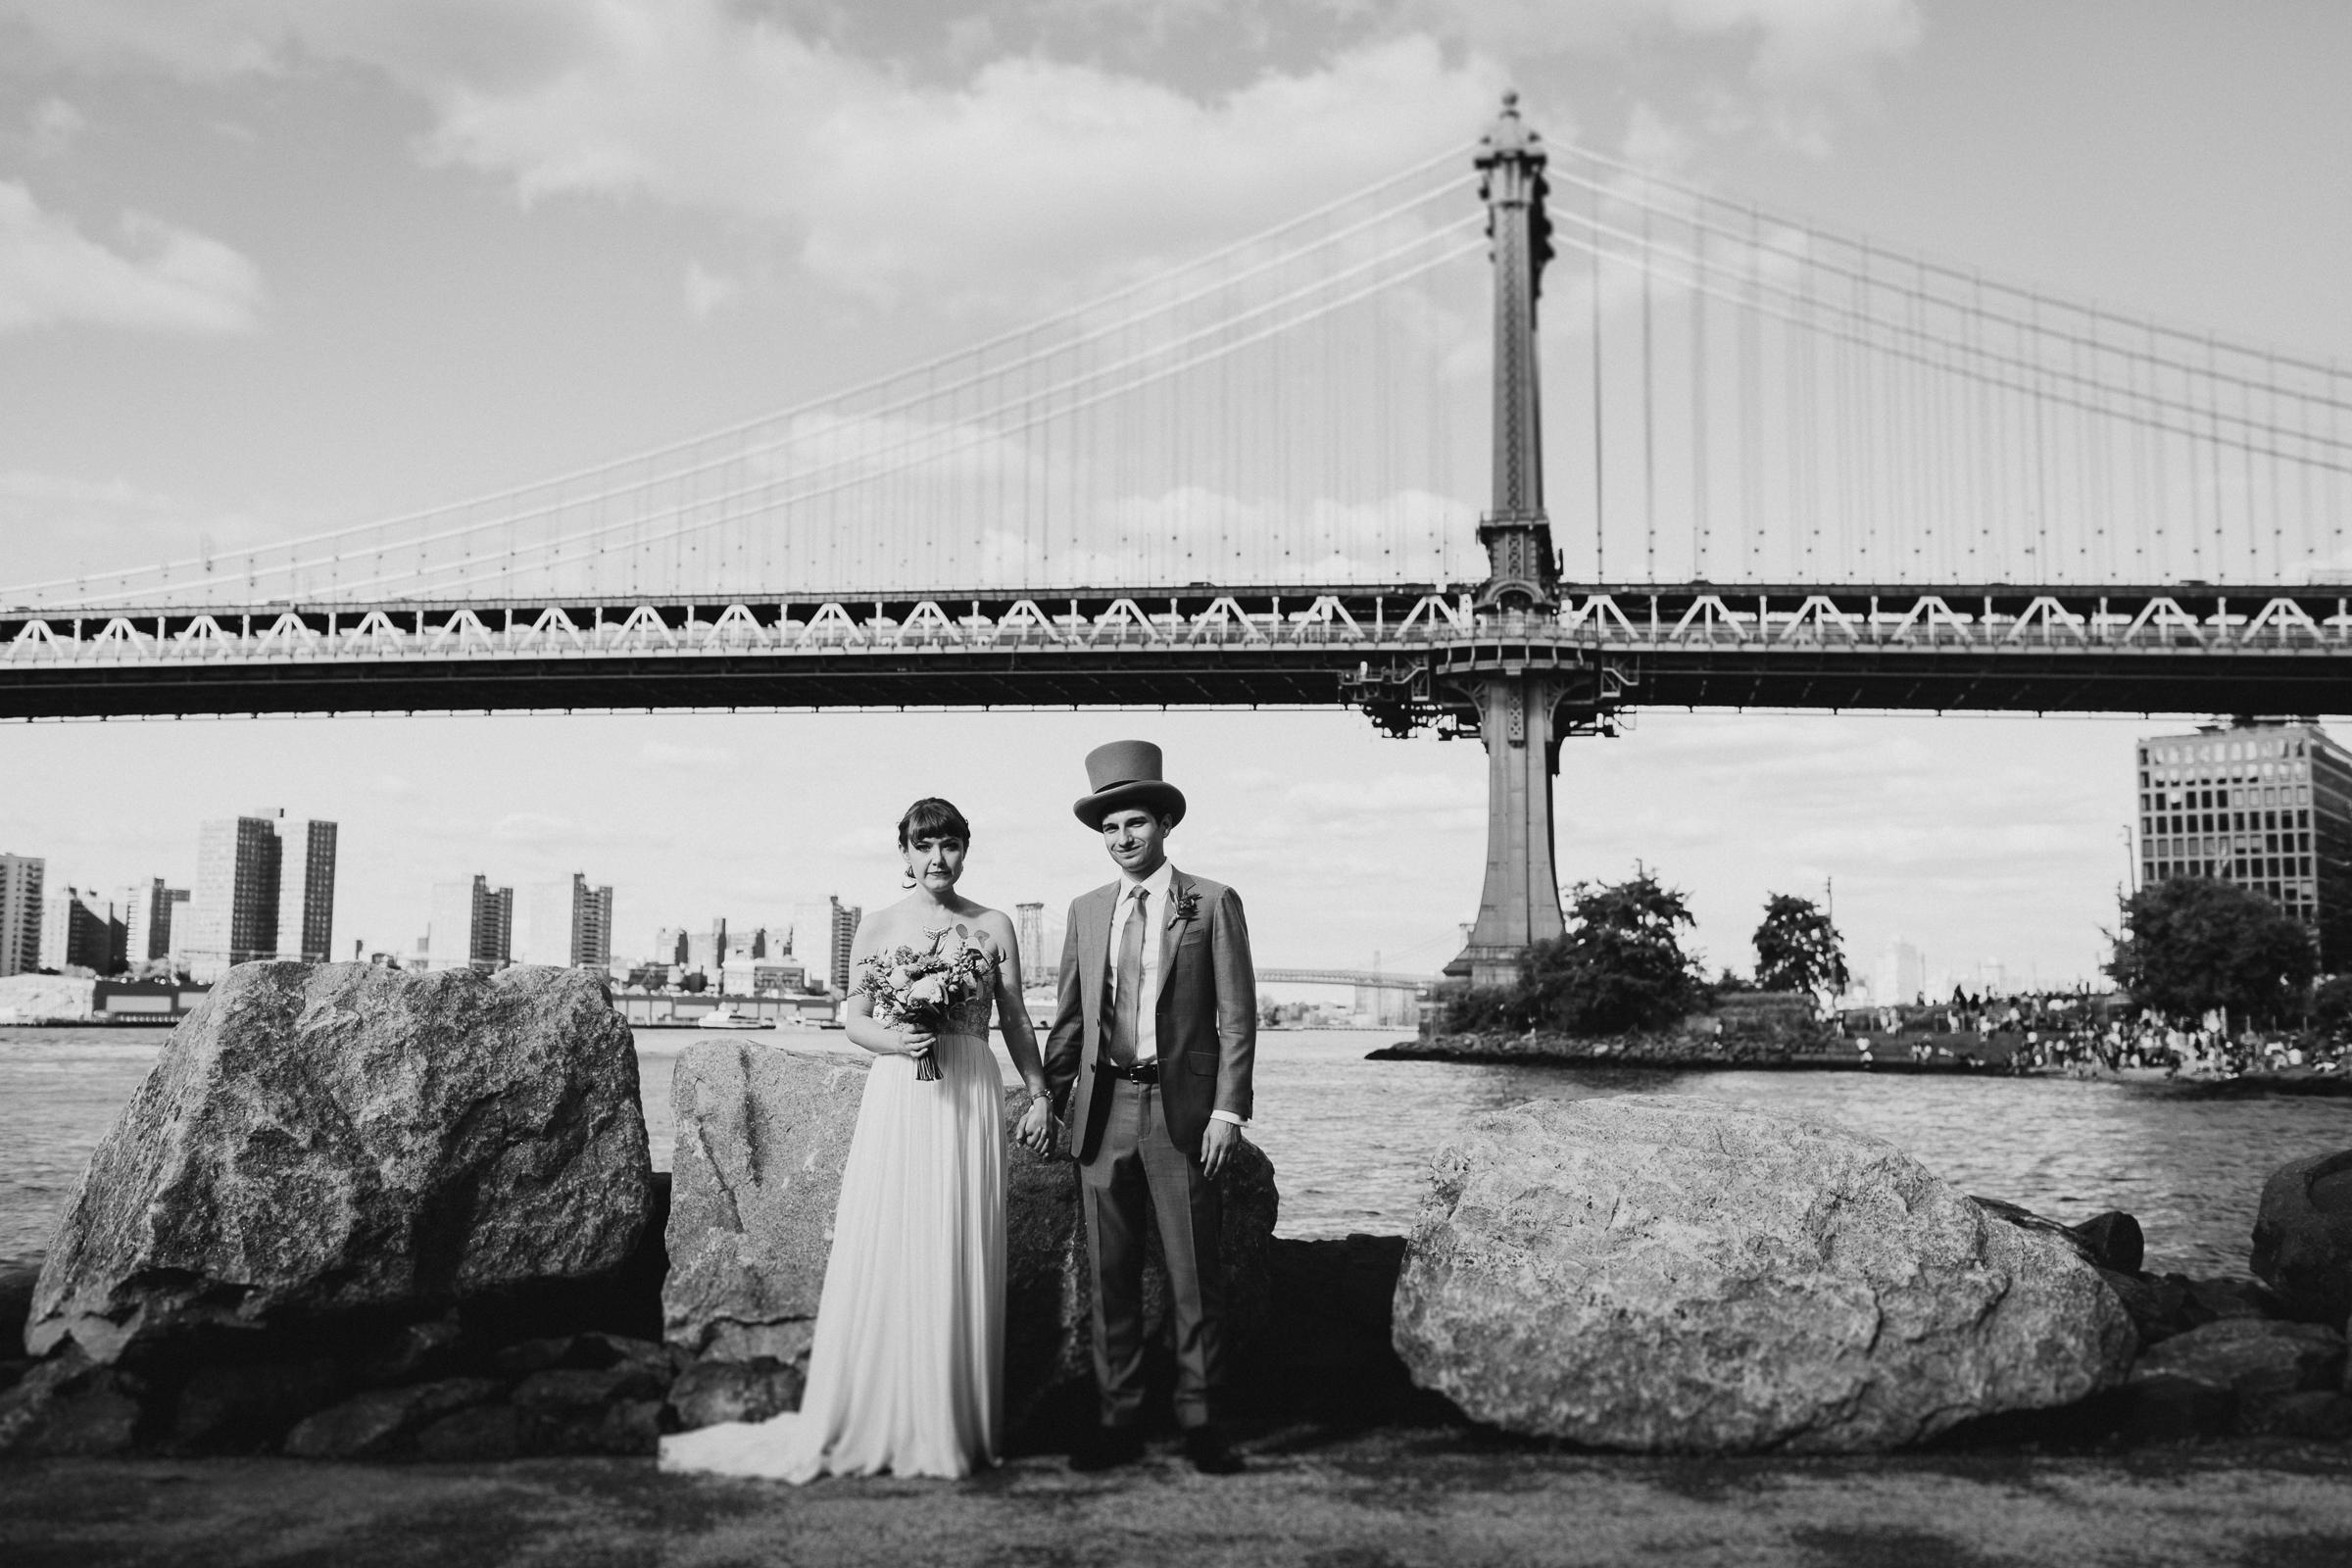 Dinosaur-Inspired-Brooklyn-Wedding-26-Bridge-New-York-Documentary-Wedding-Photographer-30.jpg